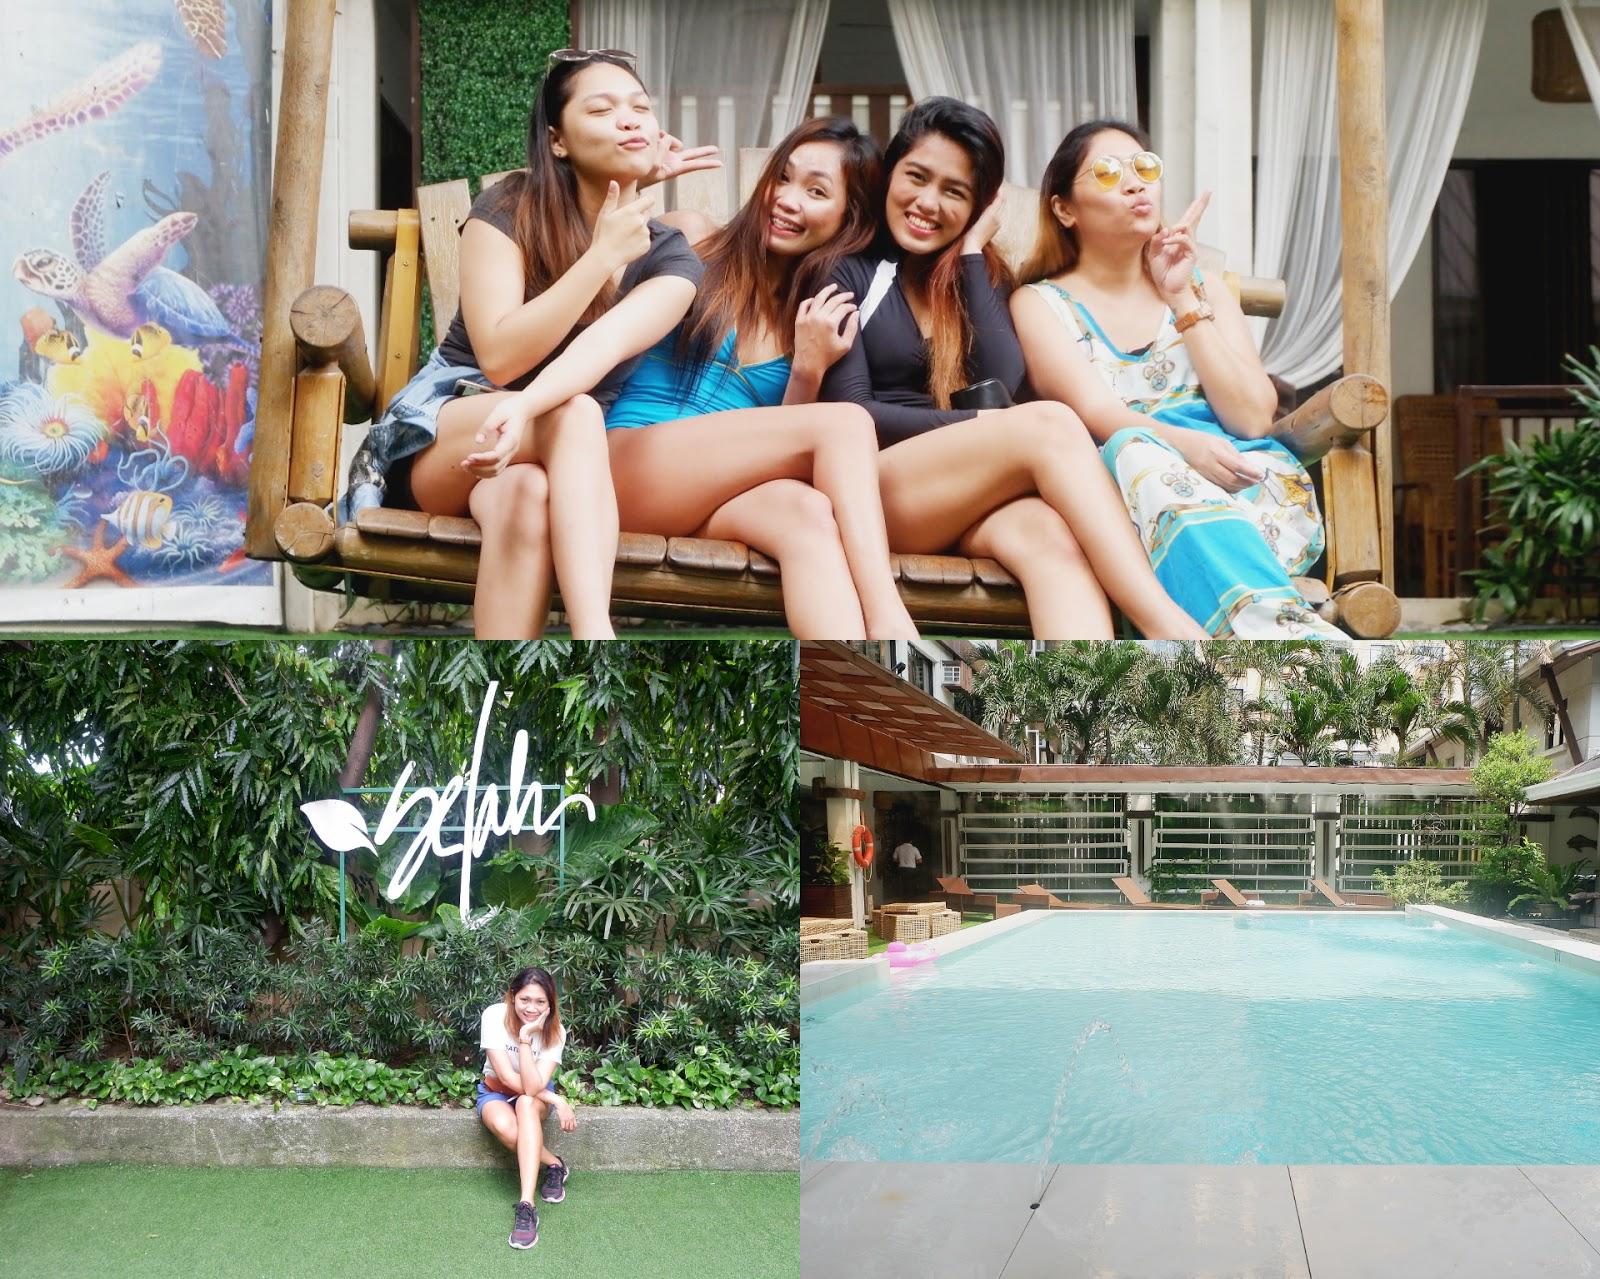 fun activities at selah garden hotel